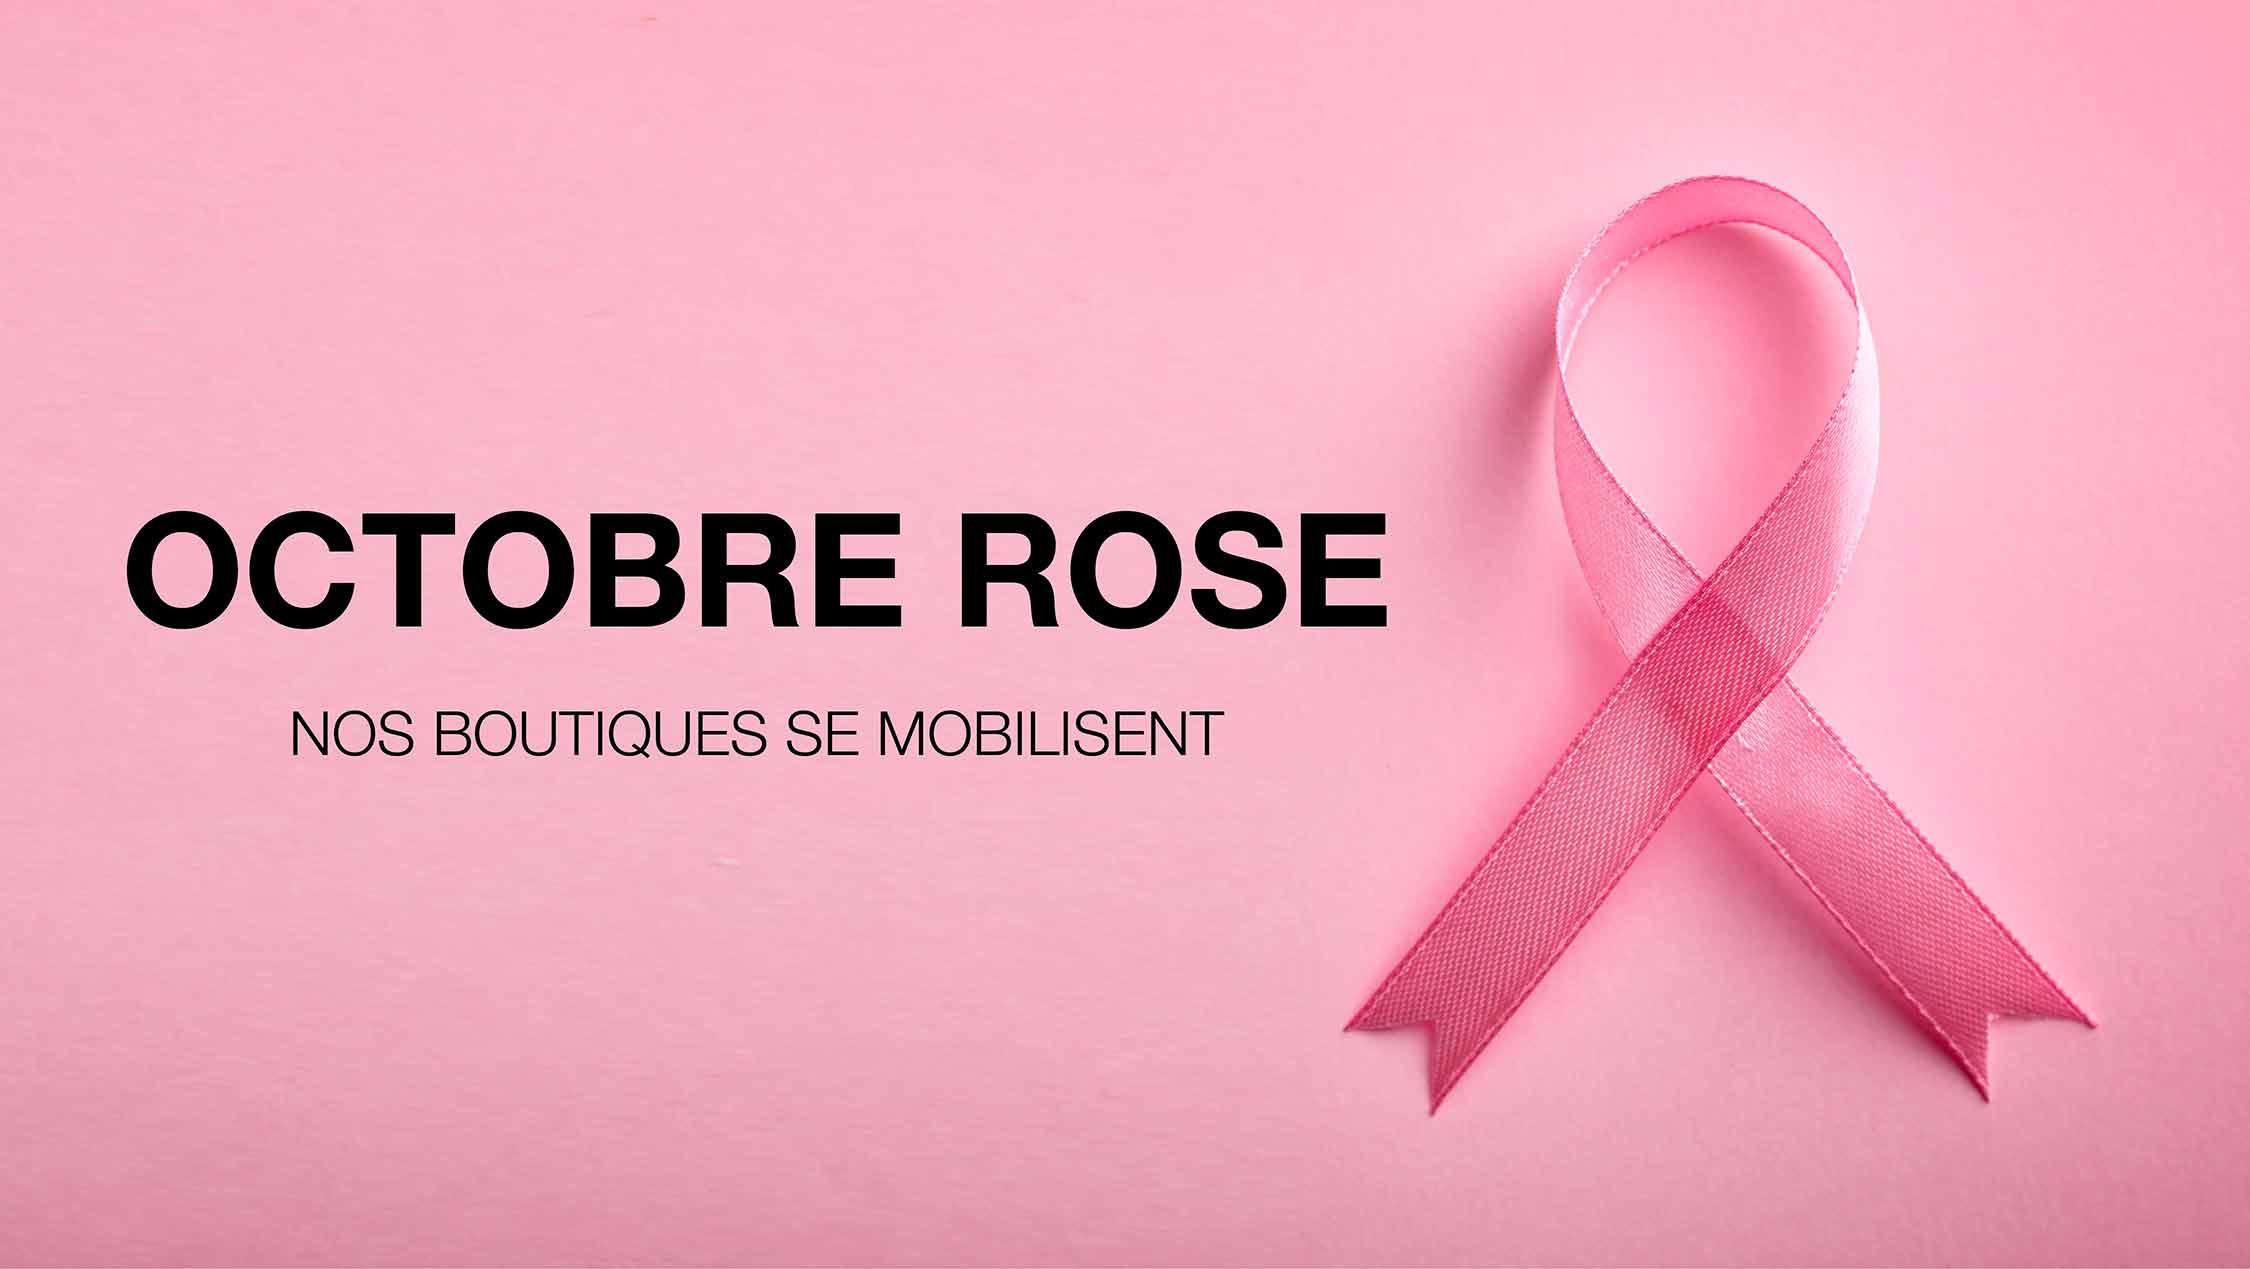 OCTOBRE ROSE - VOS BOUTIQUES SE MOBILISENT